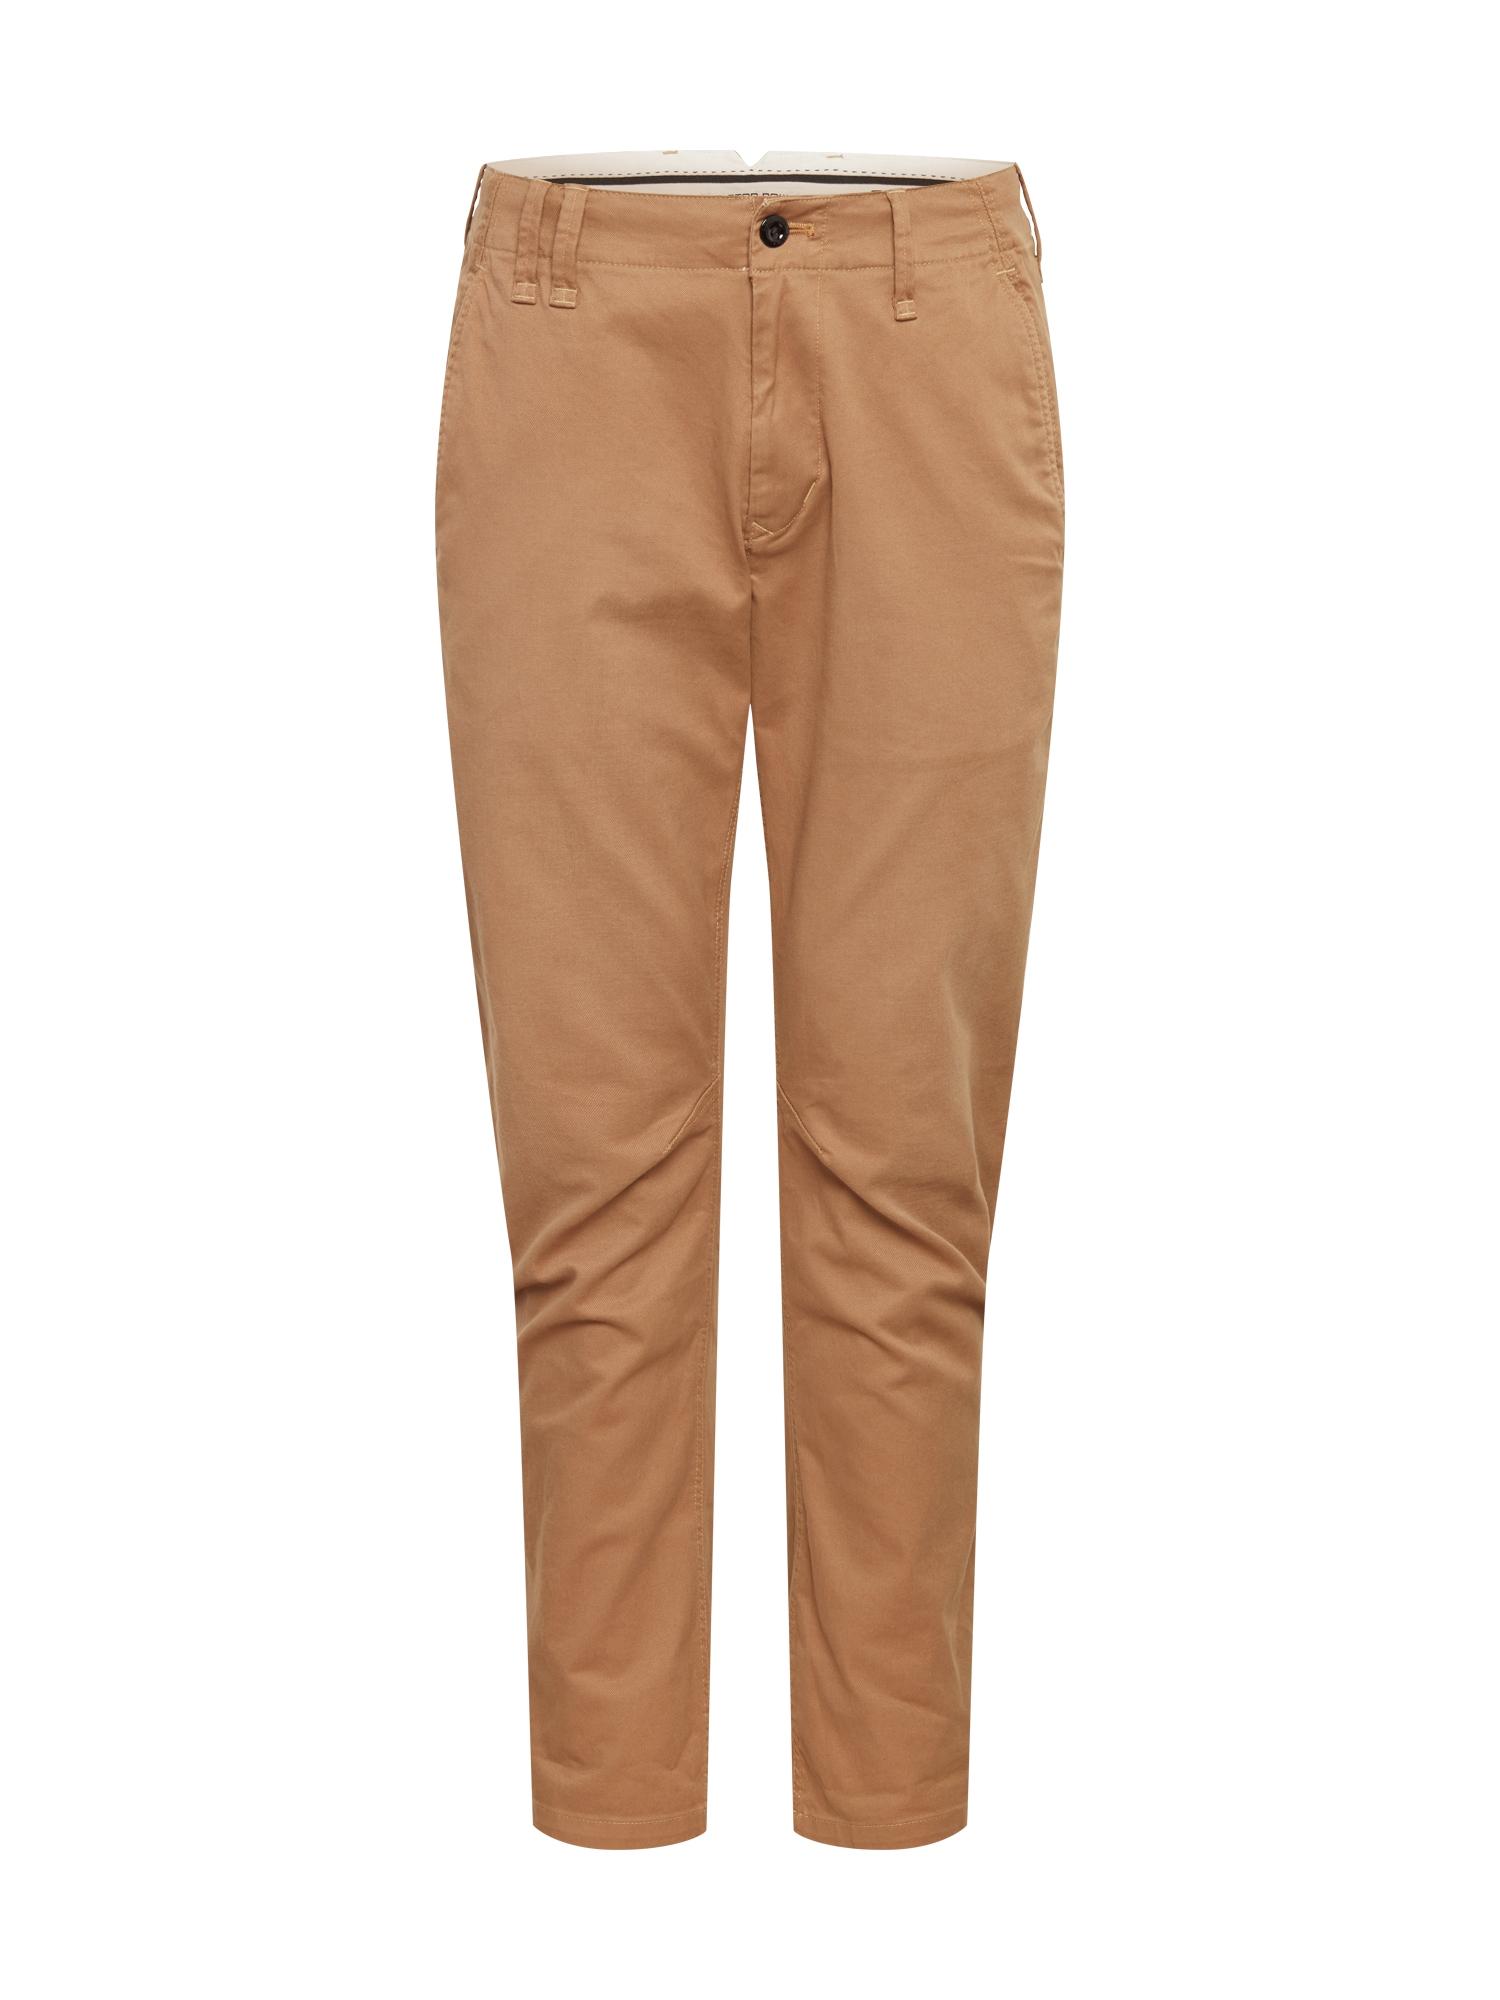 G-Star RAW Chino kalhoty 'Vetar'  světle hnědá